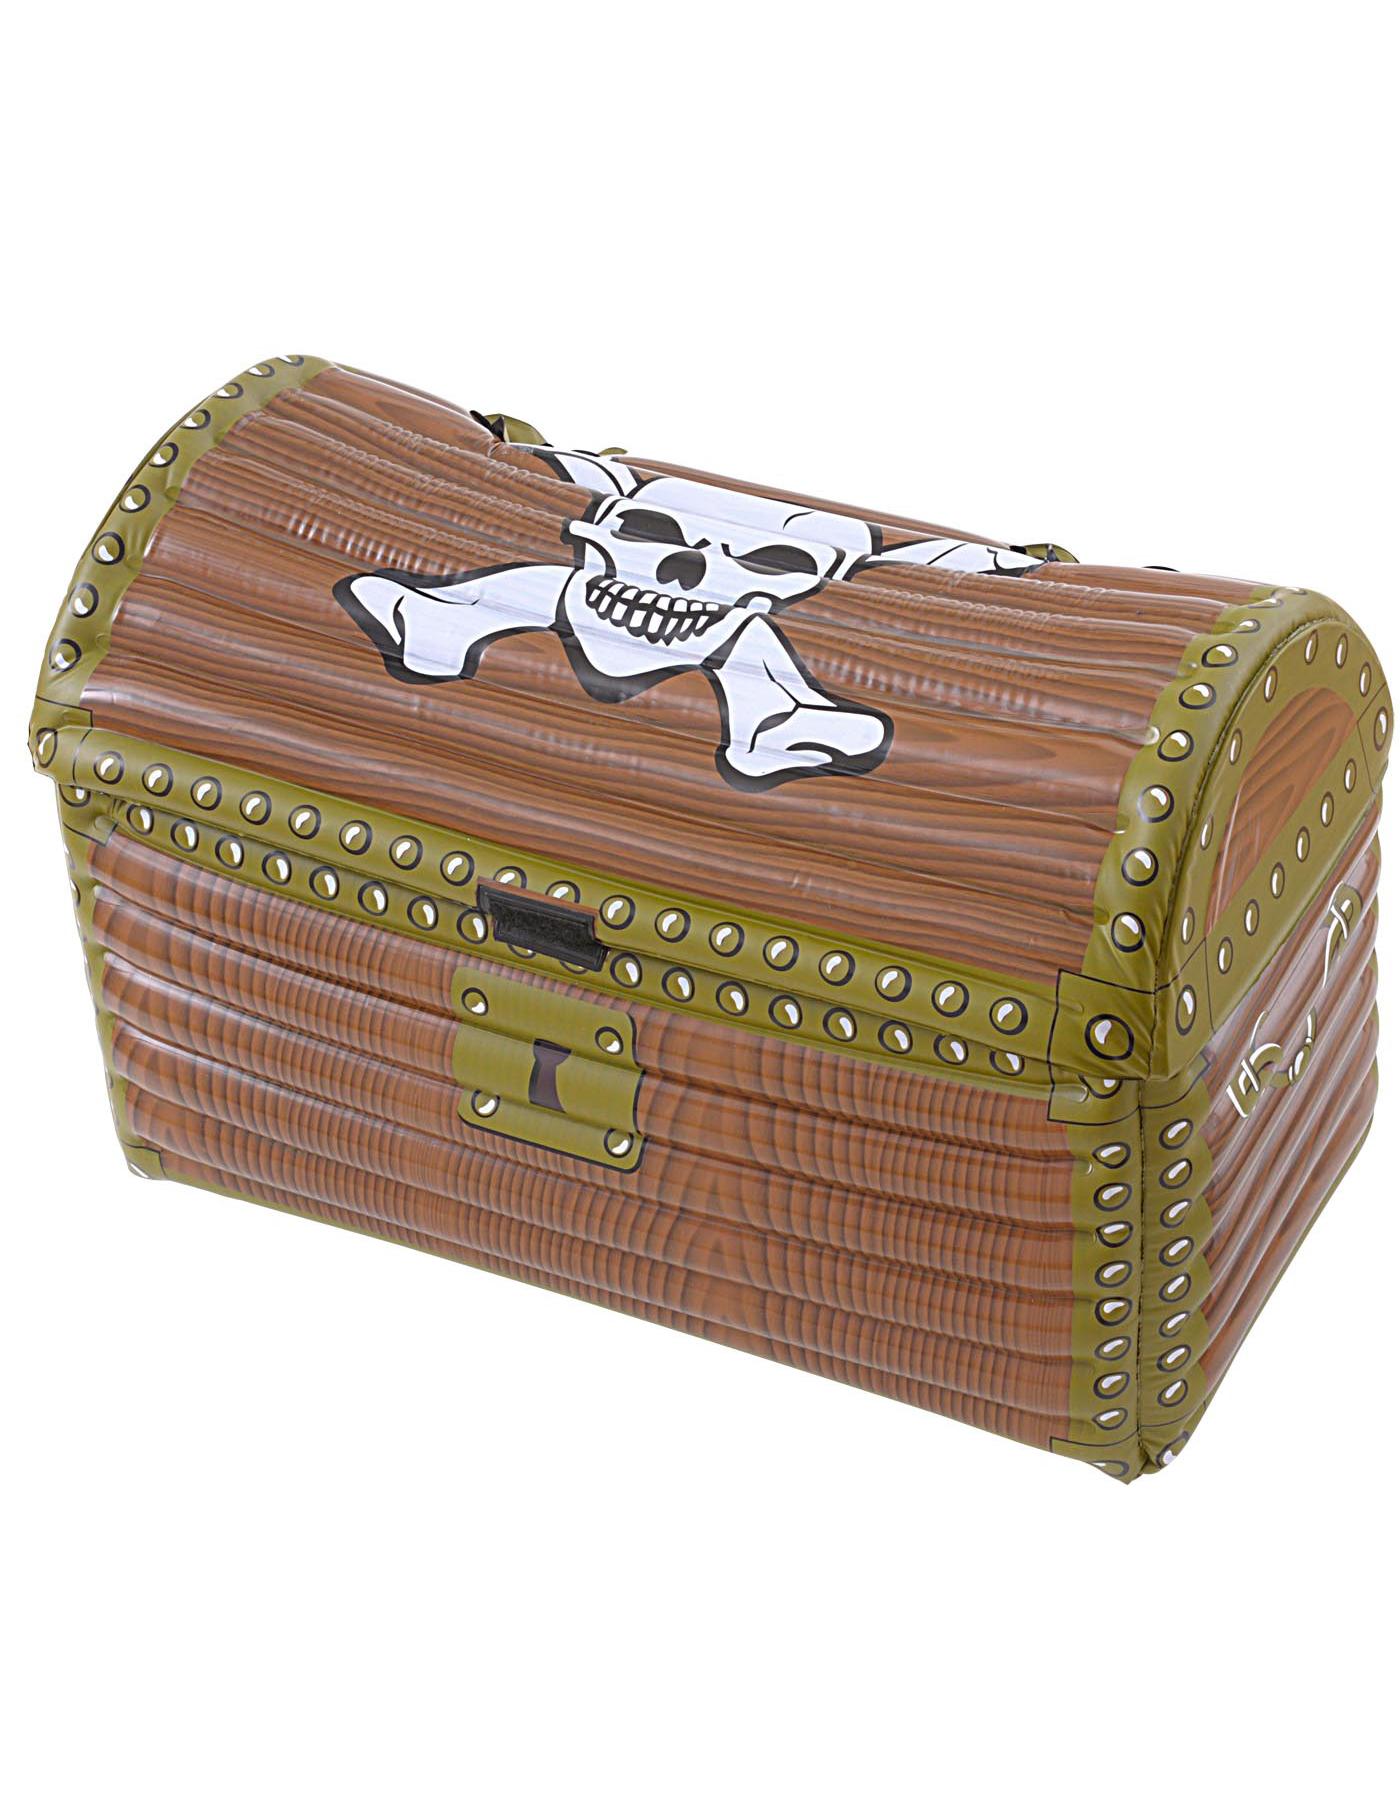 Image Coffre Pirate coffre pirate gonflable : deguise-toi, achat de decoration / animation